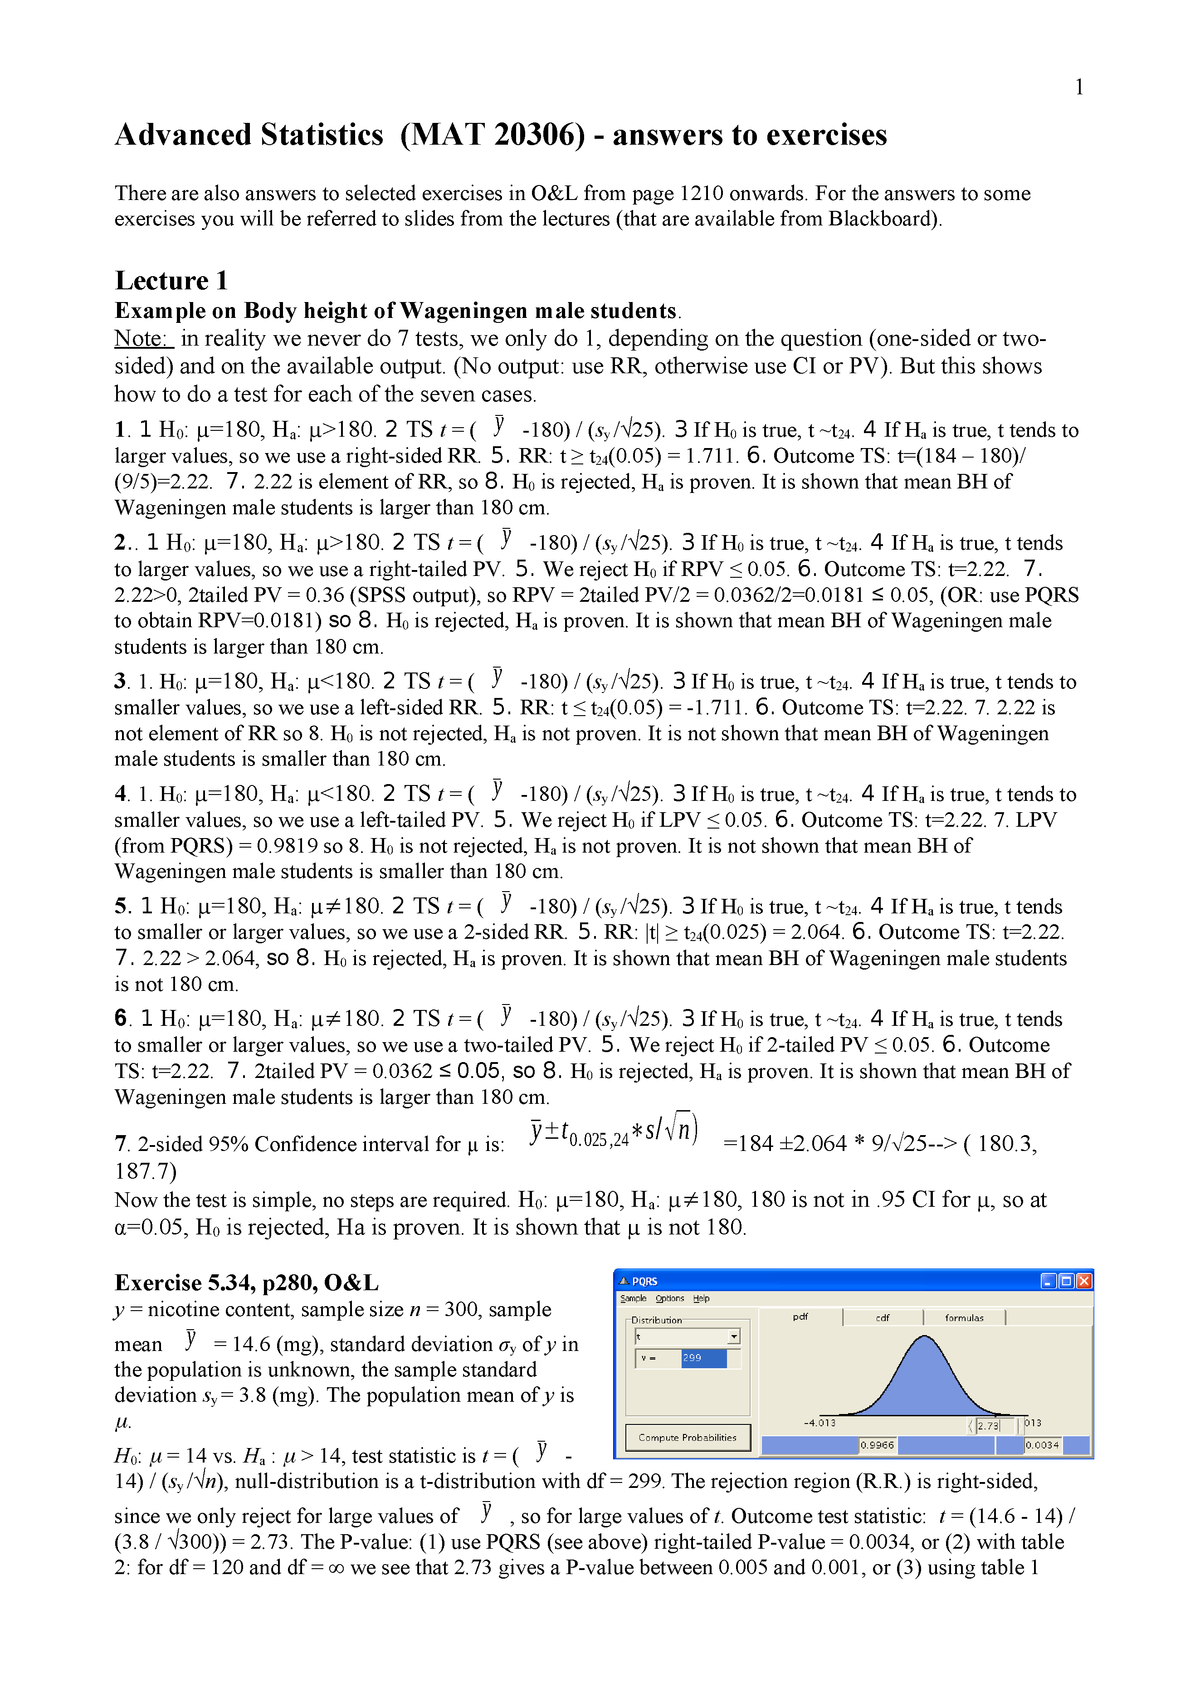 Answers study guide Werkgroep uitwerkingen - MAT-20306